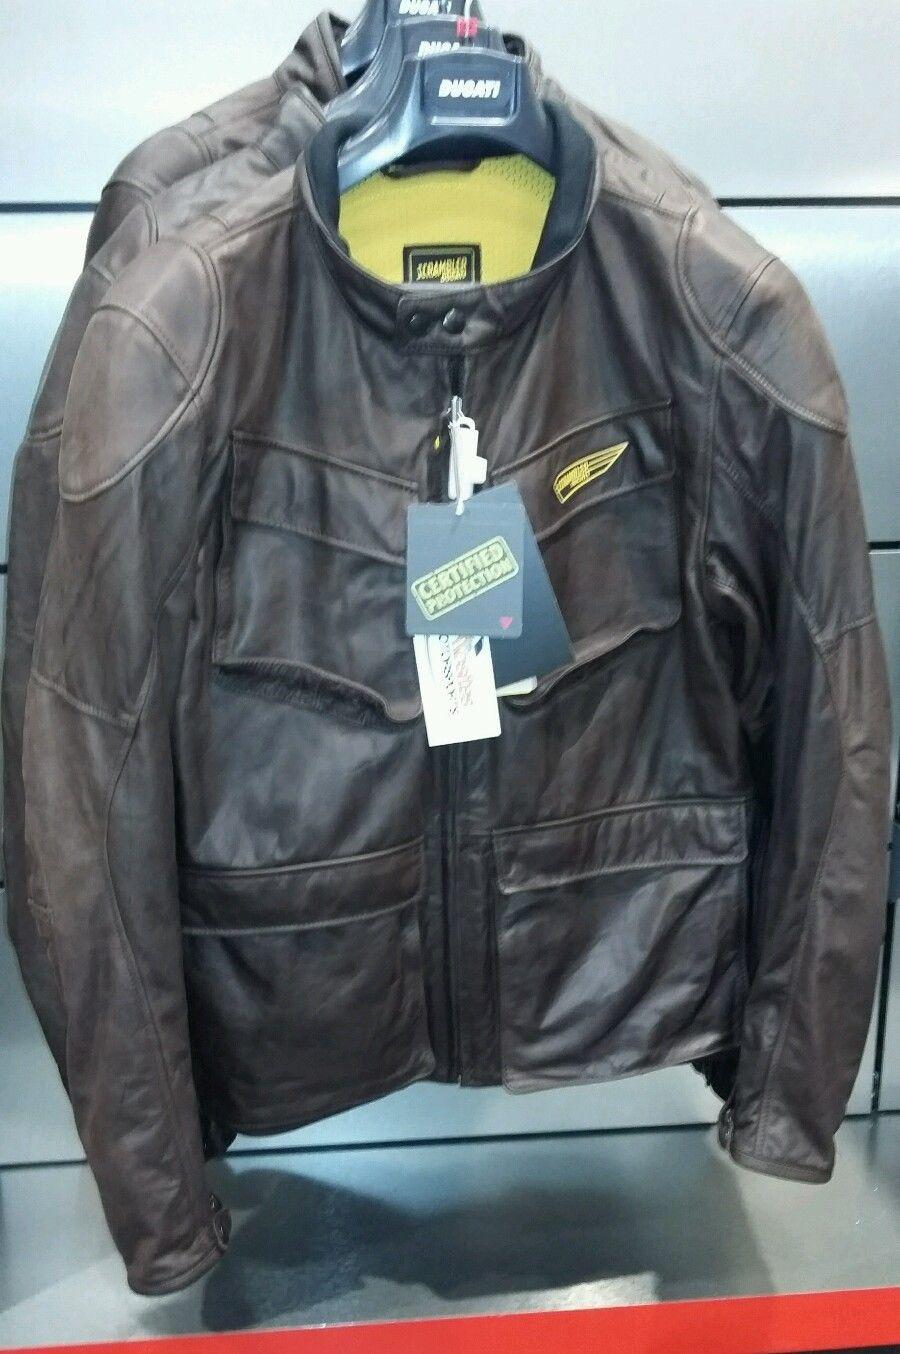 ducati quattrotasche scrambler leather jacket all sizes 9810312 | ebay